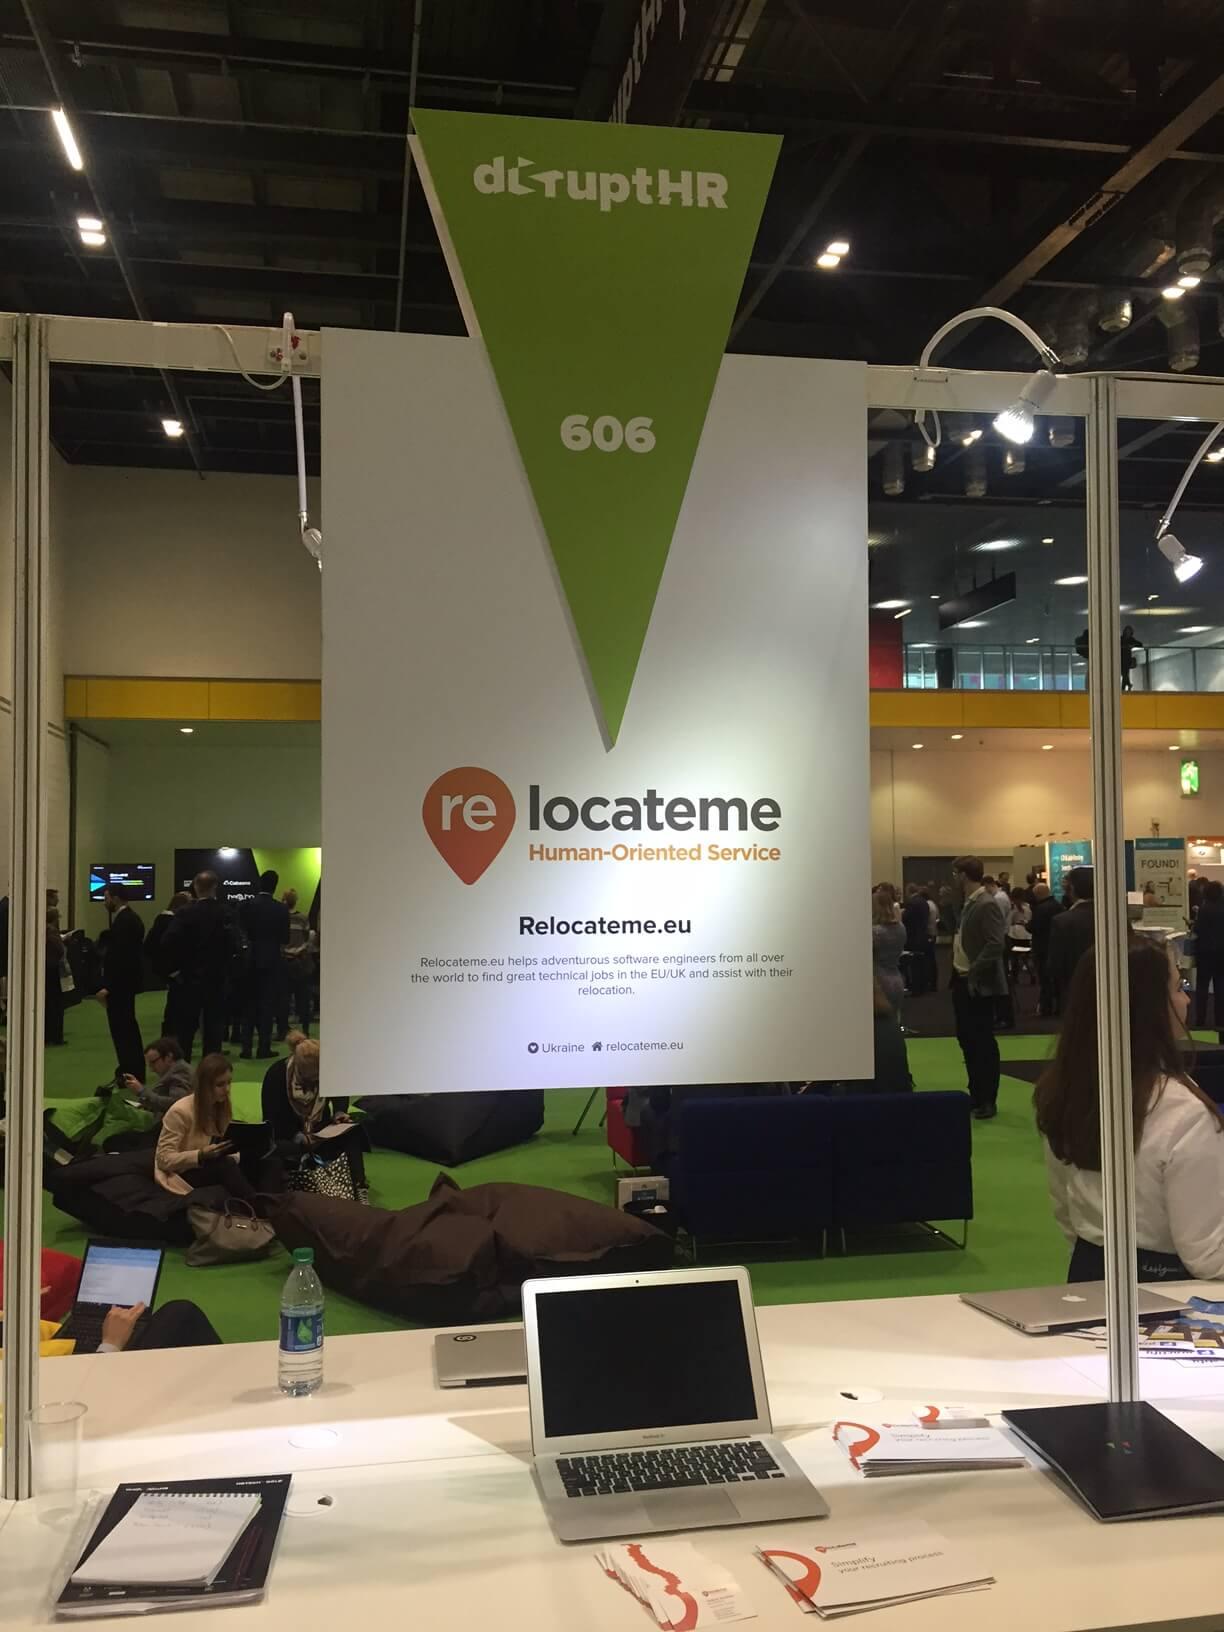 IMG_2163-1 — Relocateme.eu - Job relocation service